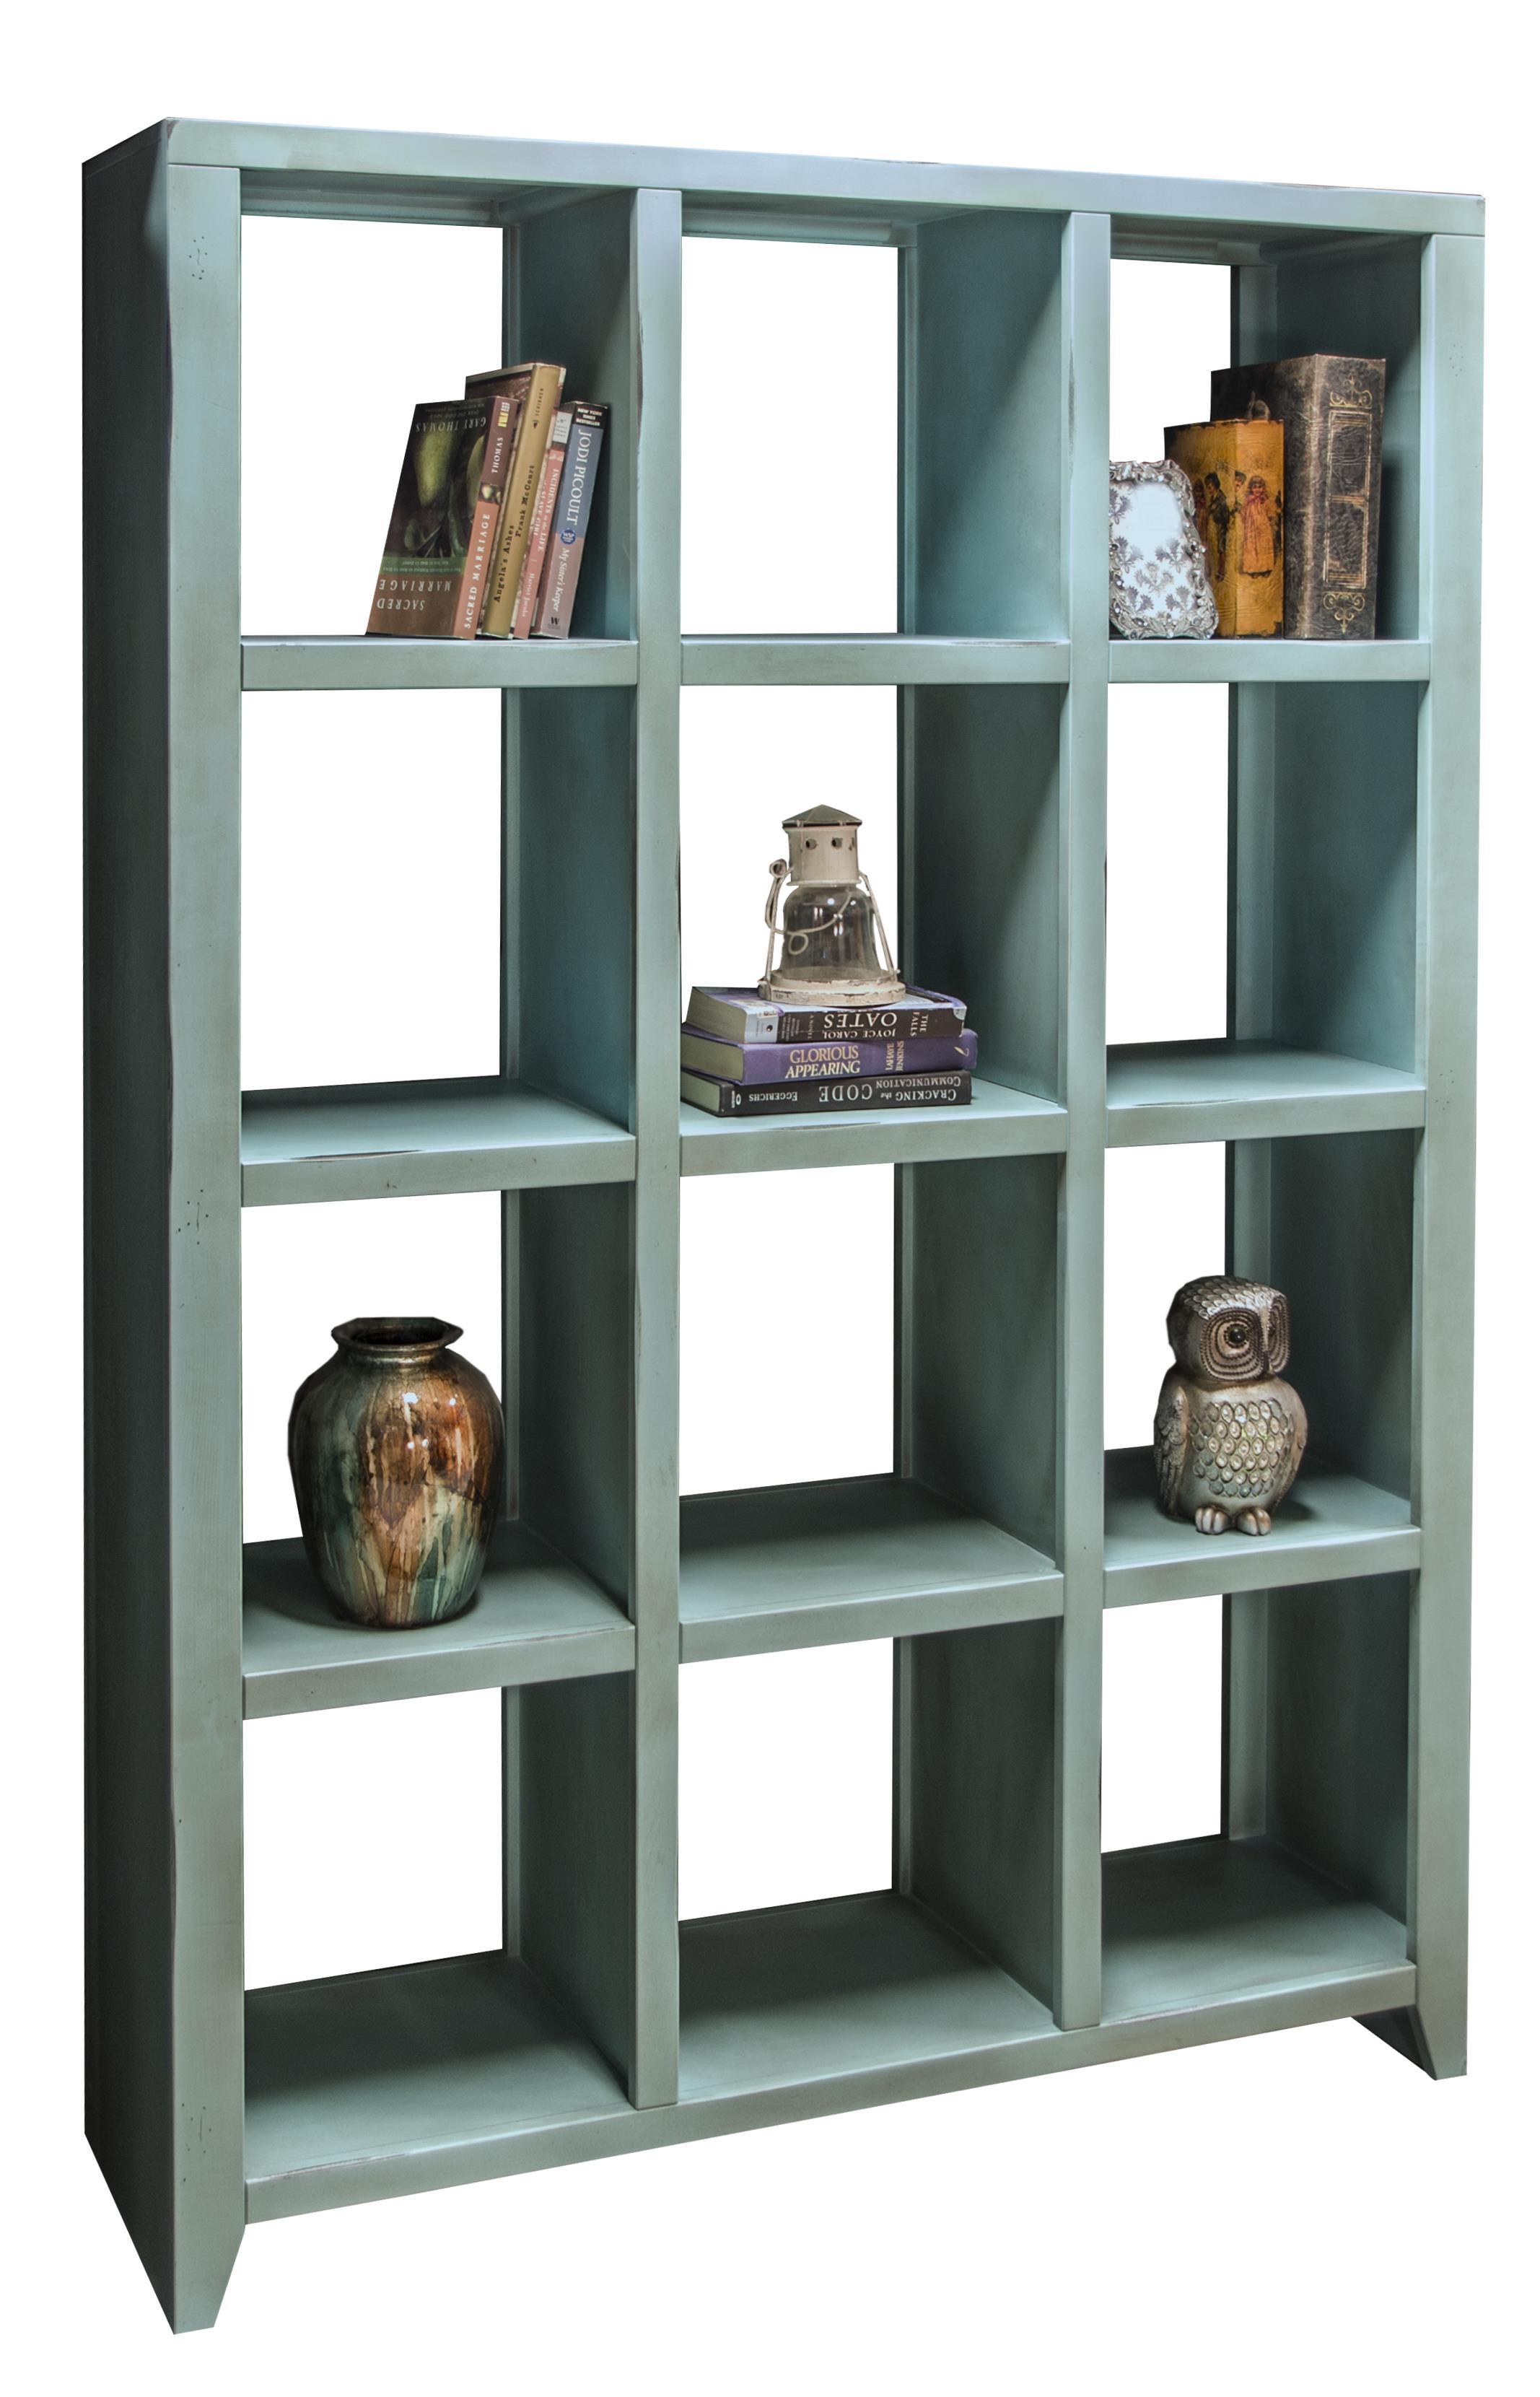 Legends Furniture Calistoga Collection Calistoga Room Divider - Item Number: CA6204-RBL